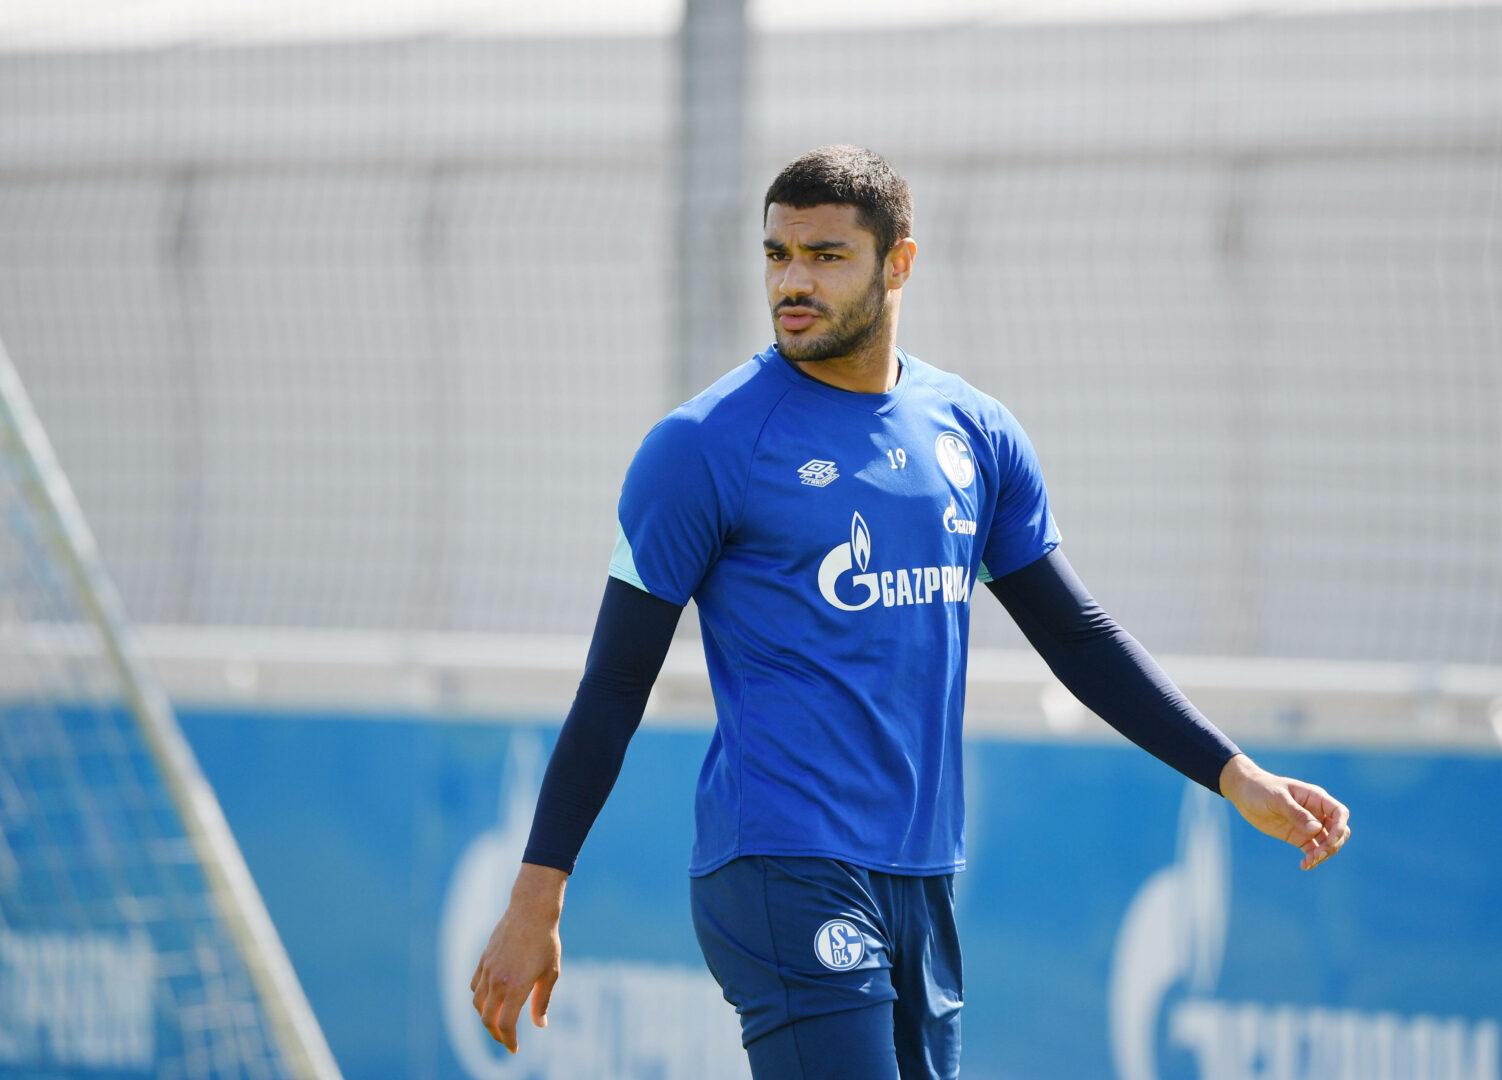 Ozan Kabak im Trainingsdress von Schalke 04